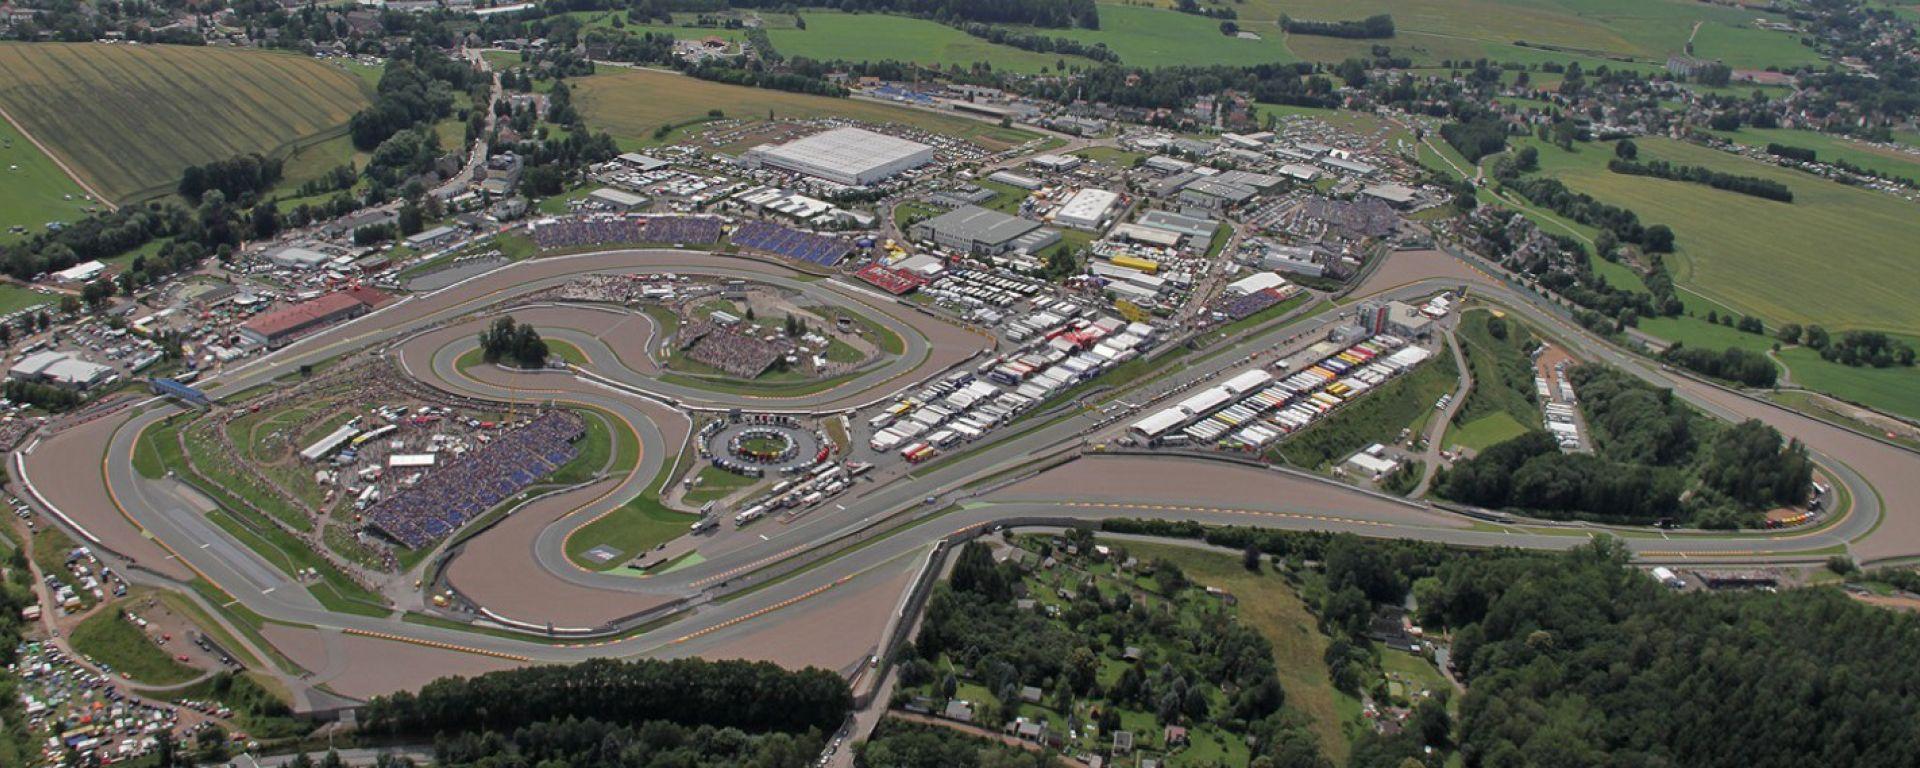 MotoGP Sachsenring Germania: Prove libere, qualifiche, risultati gara